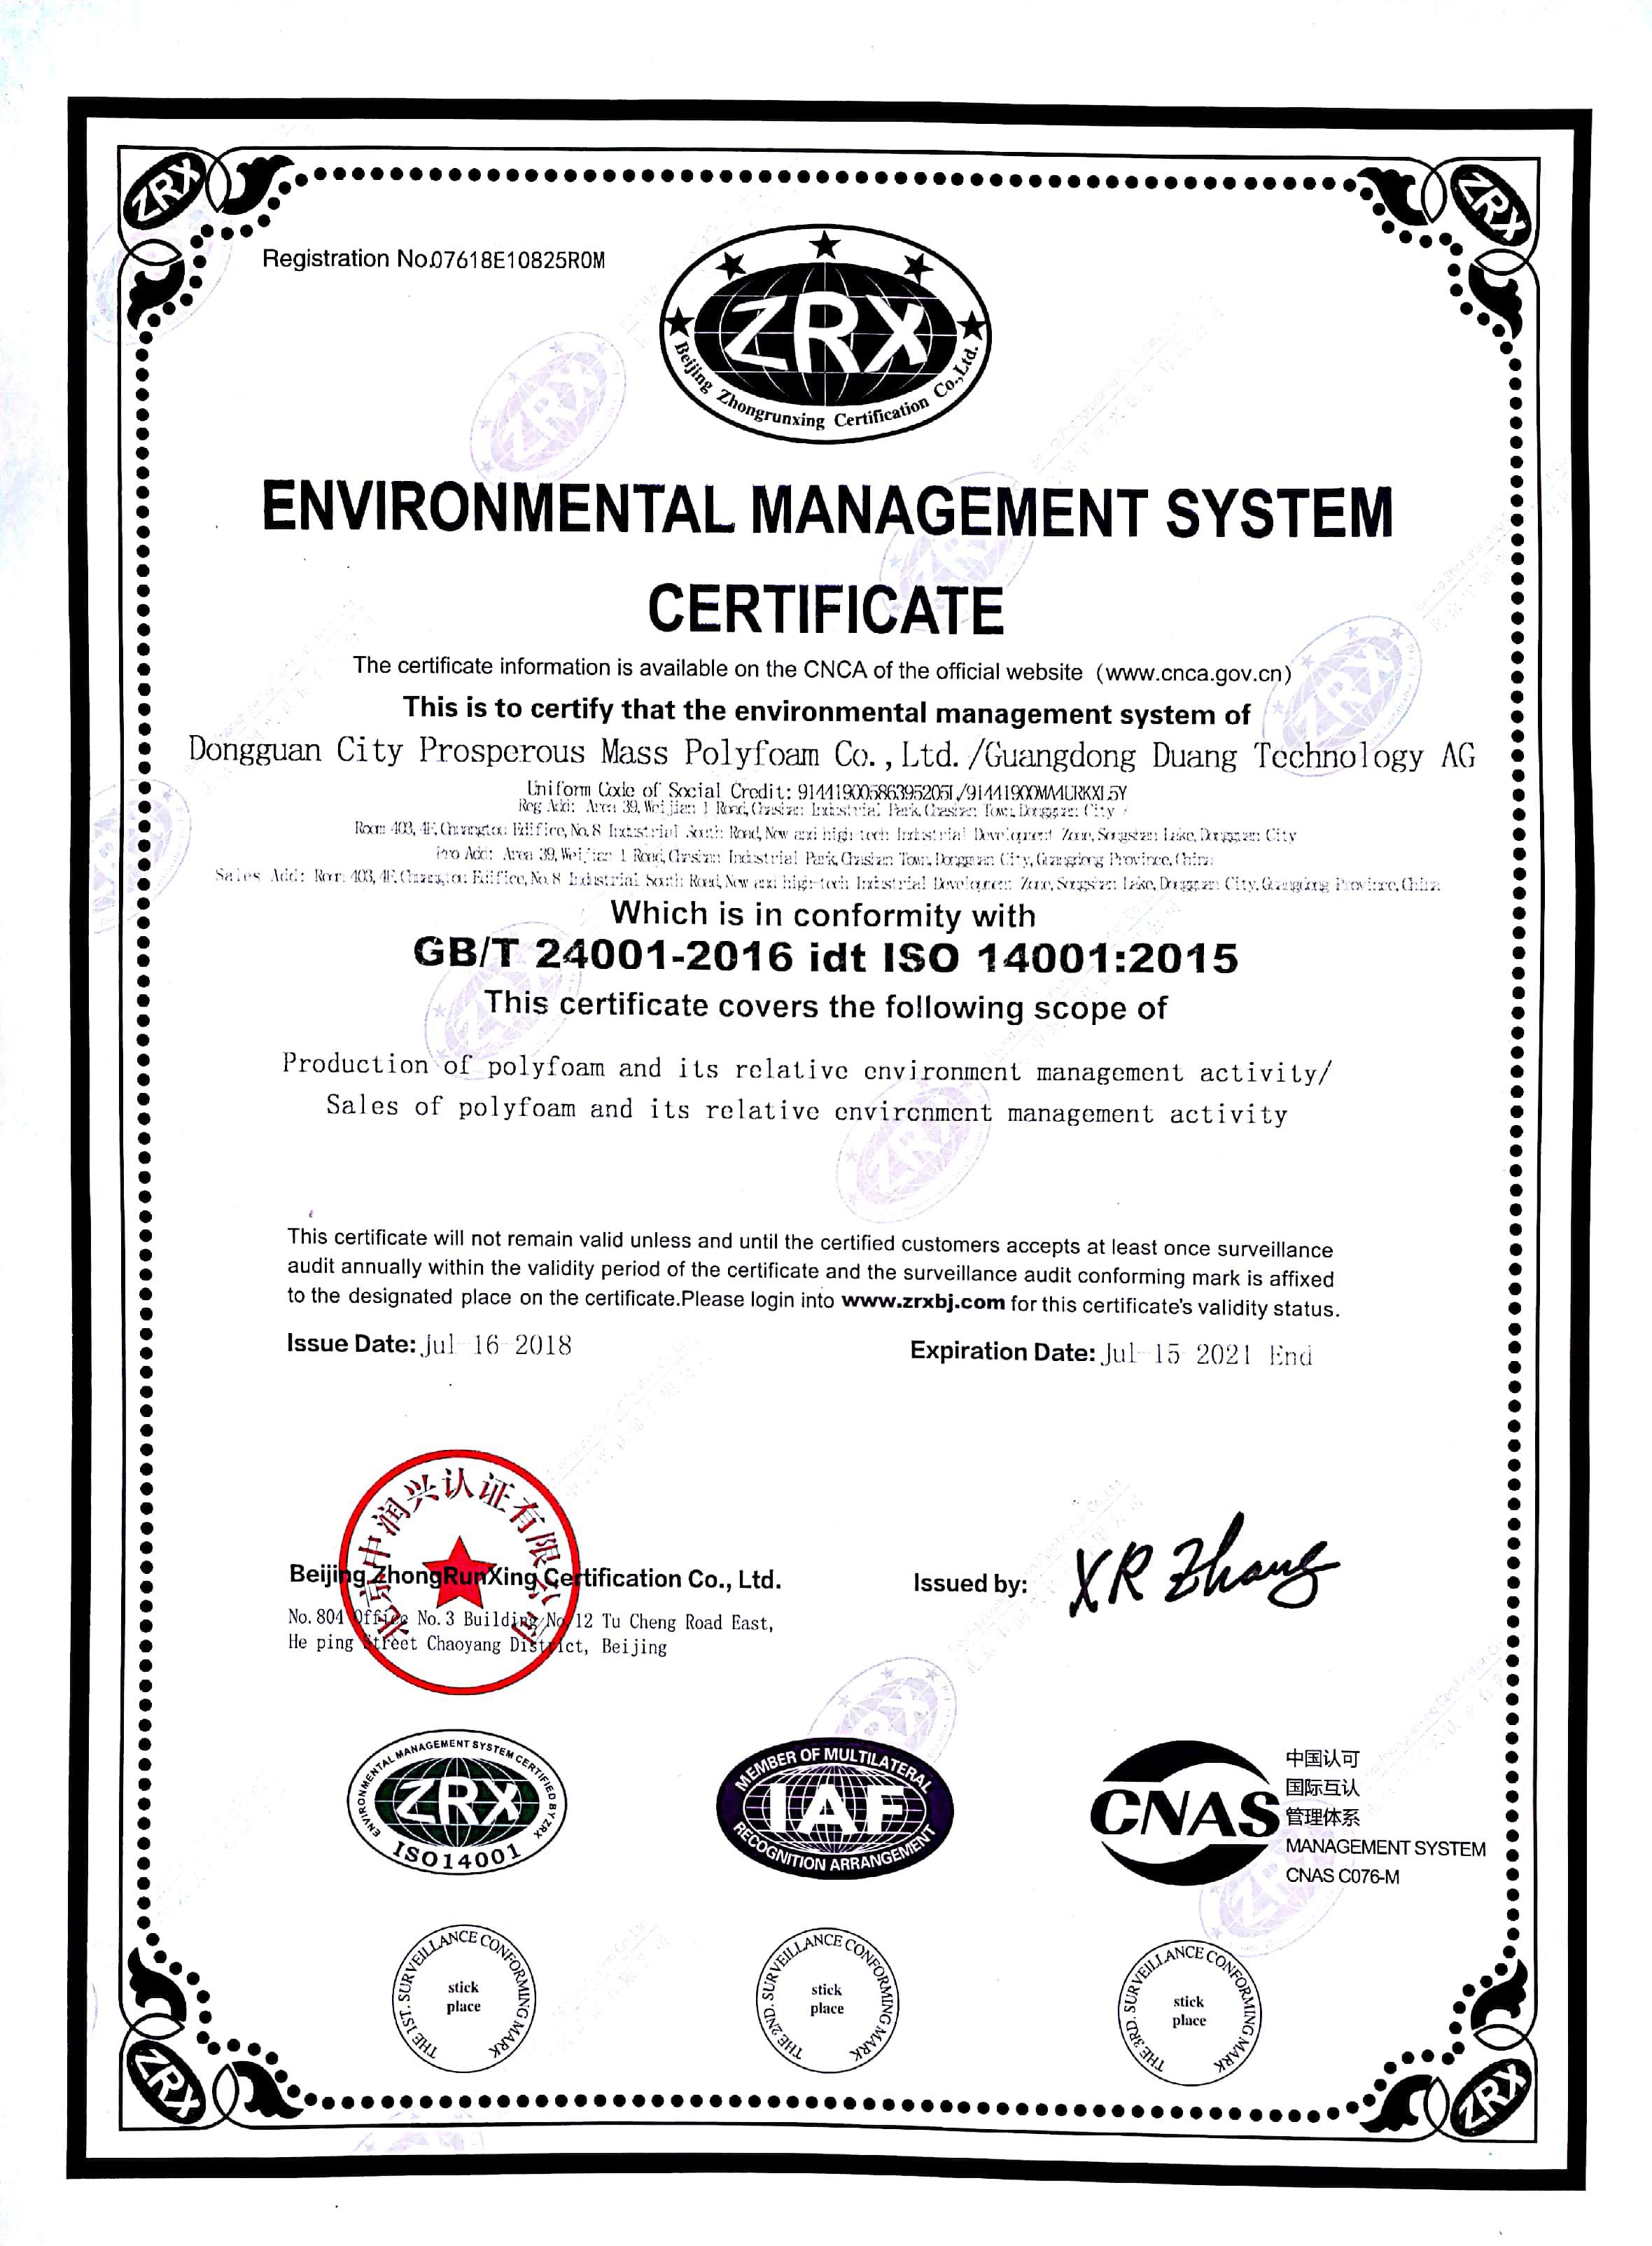 ISO140012015眾亨頂創英文證書